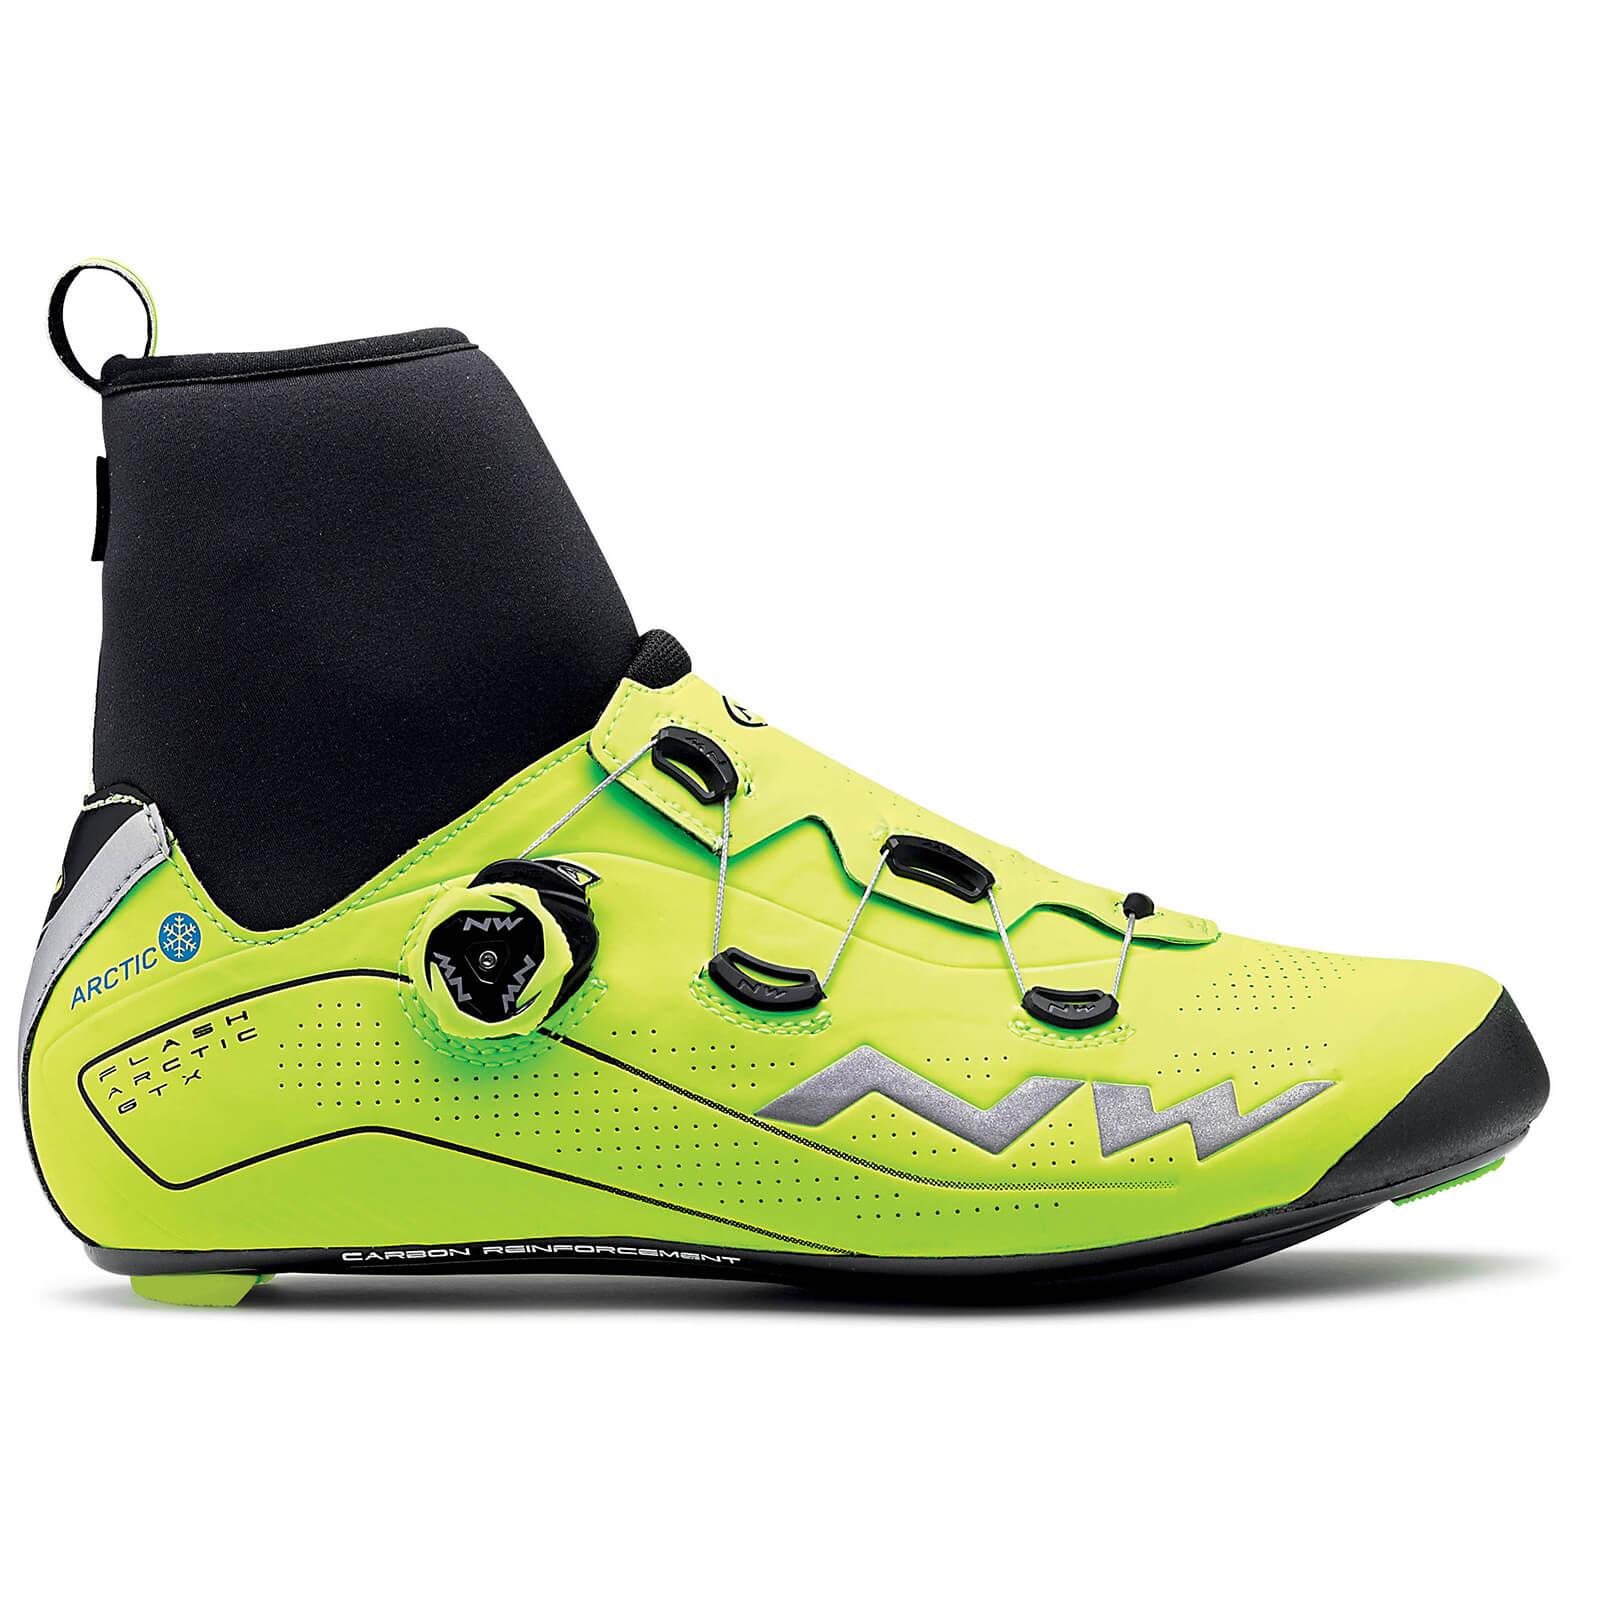 Northwave Flash Arctic Winter Boots - Yellow - EU 45 - Yellow